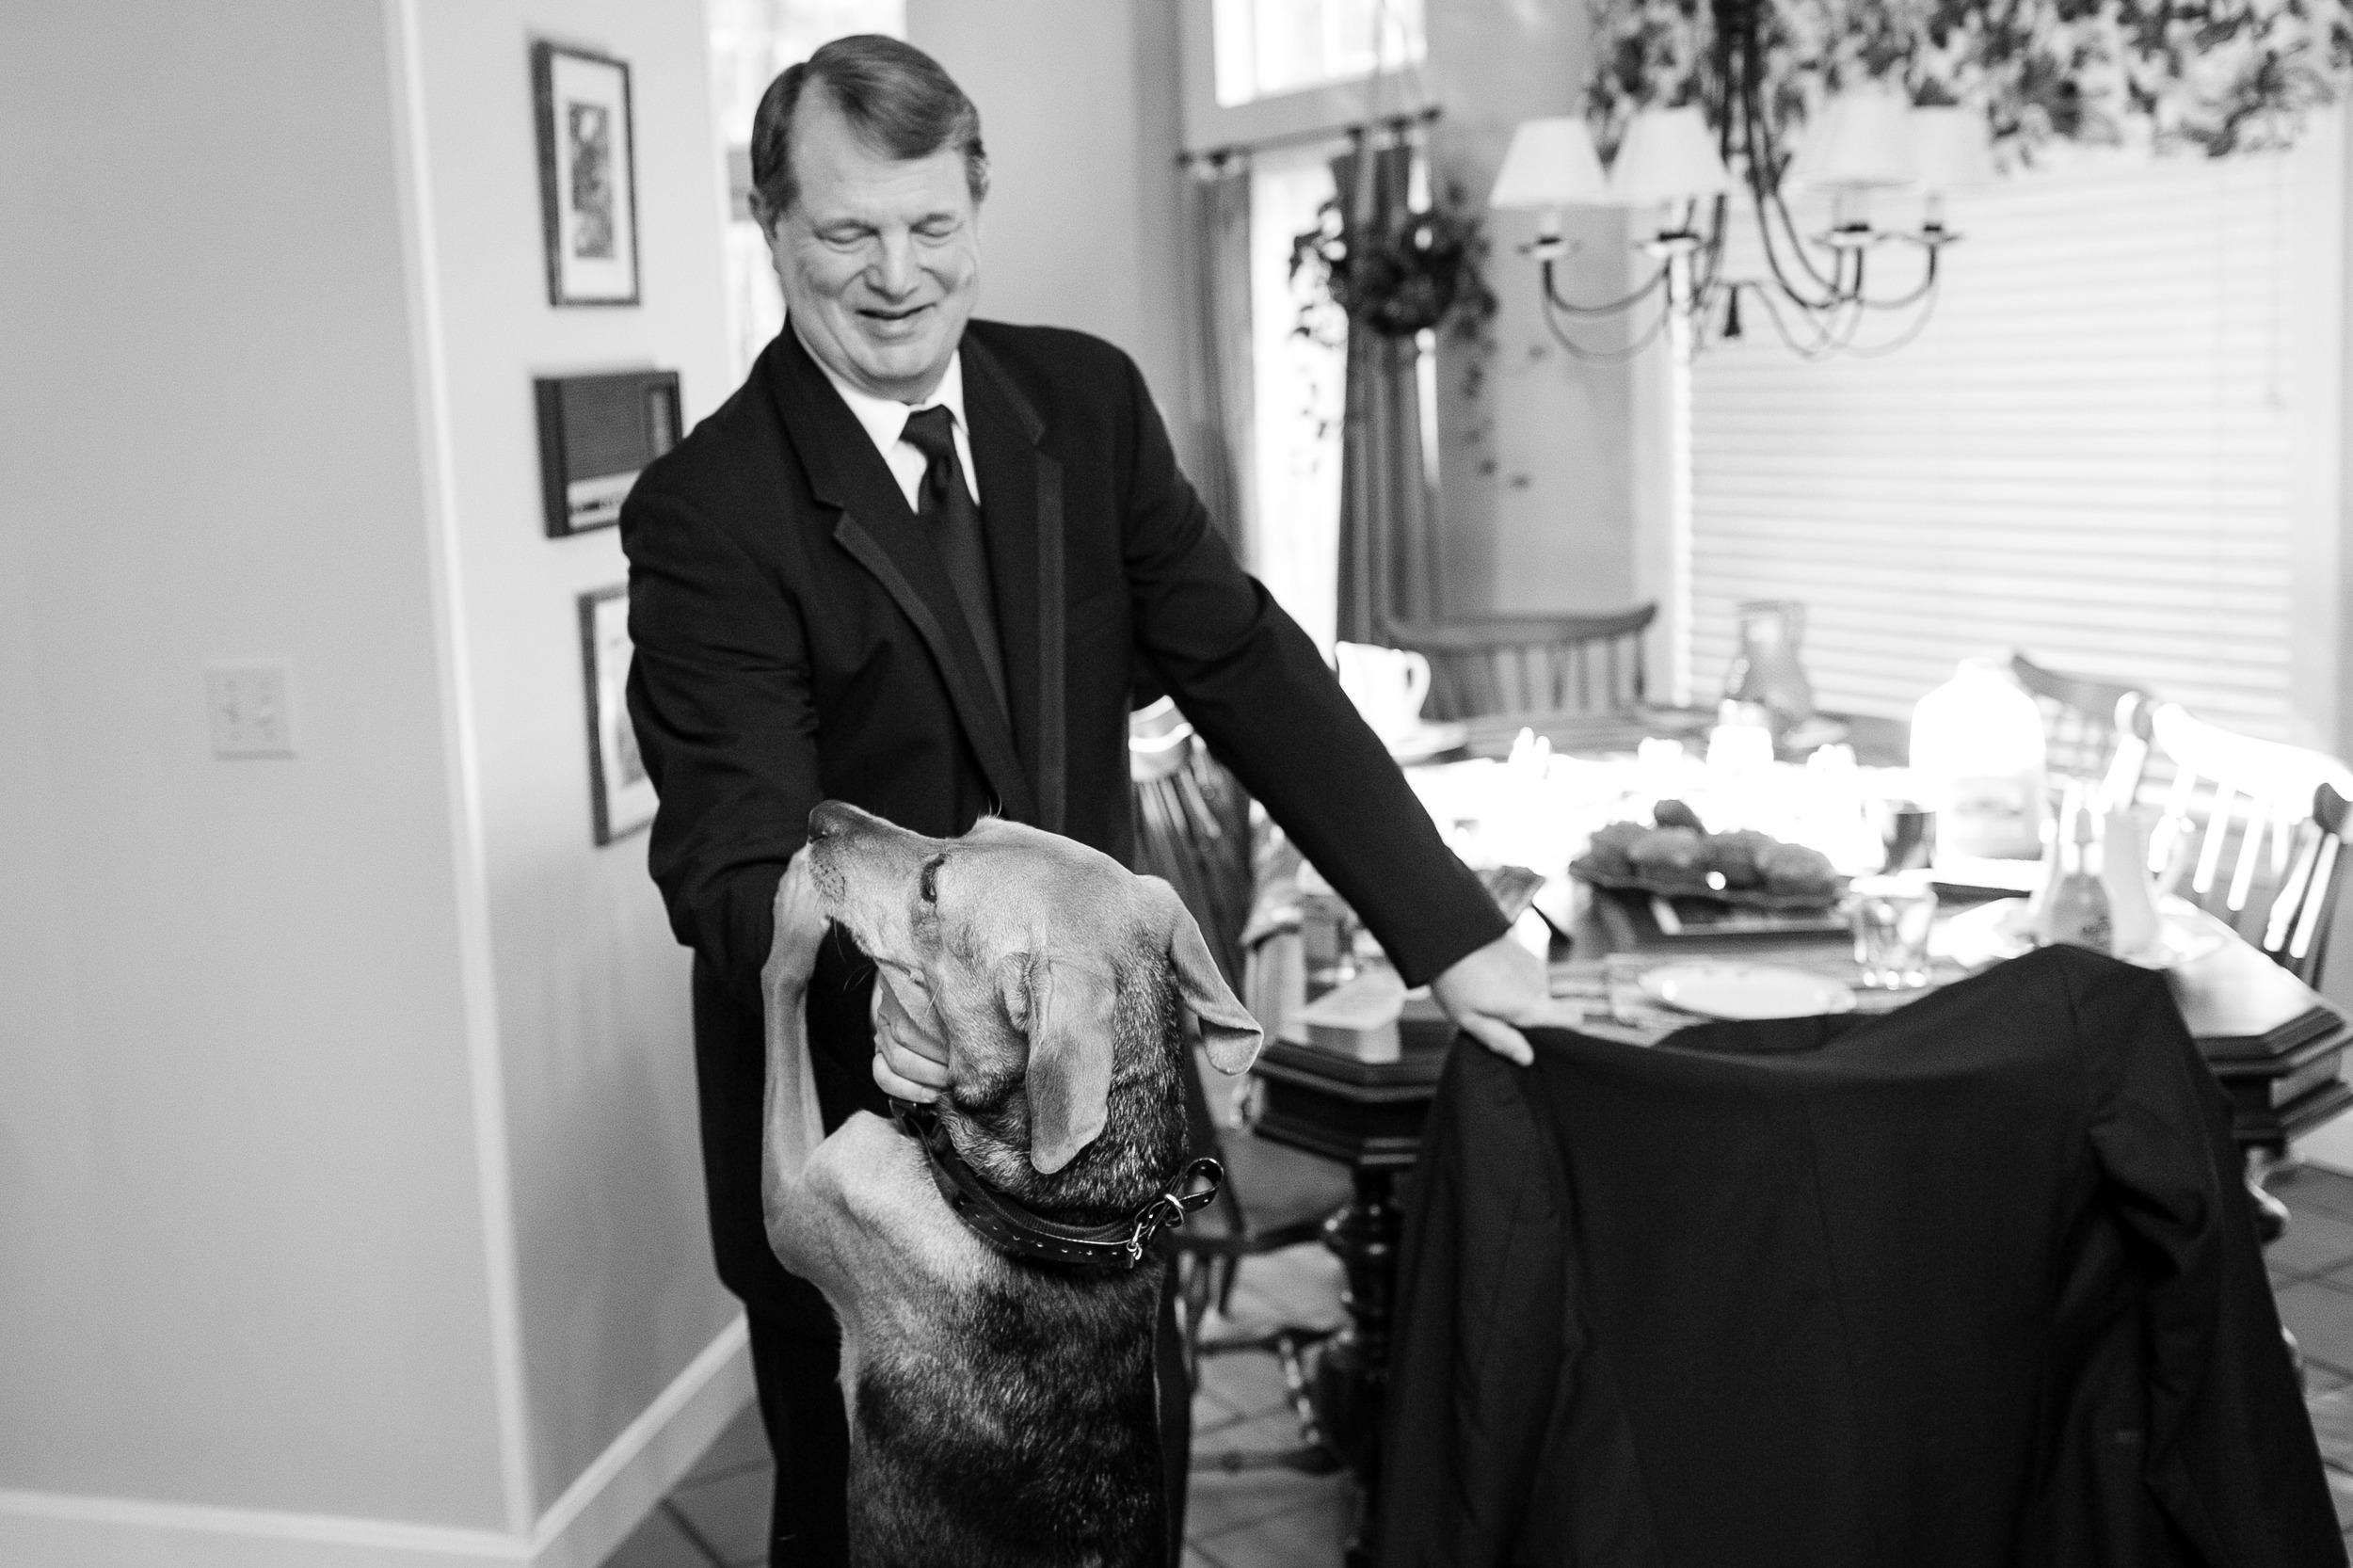 Romantic-Wedding-Aqua-Turf-Connecticut-Photojournalistic-Photography-by-Jacek-Dolata-4.jpg